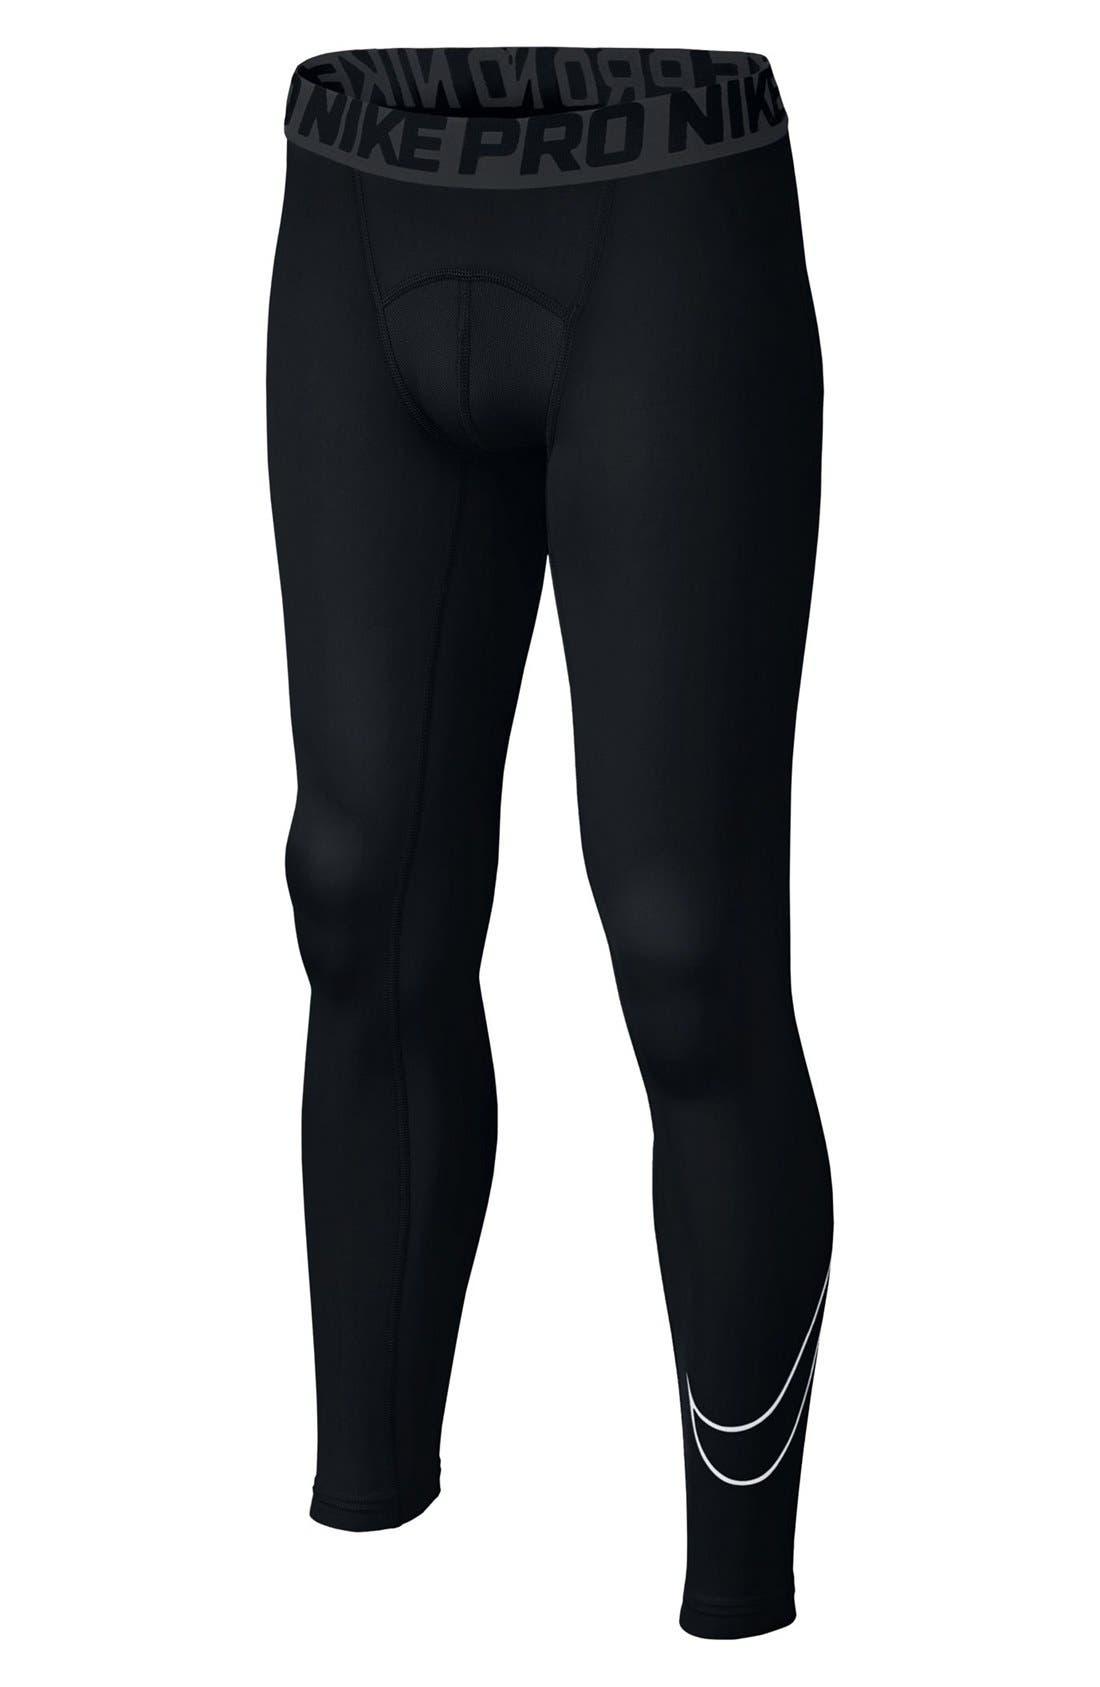 Main Image - Nike Dri-FIT Compression Tights (Little Boys & Big Boys)